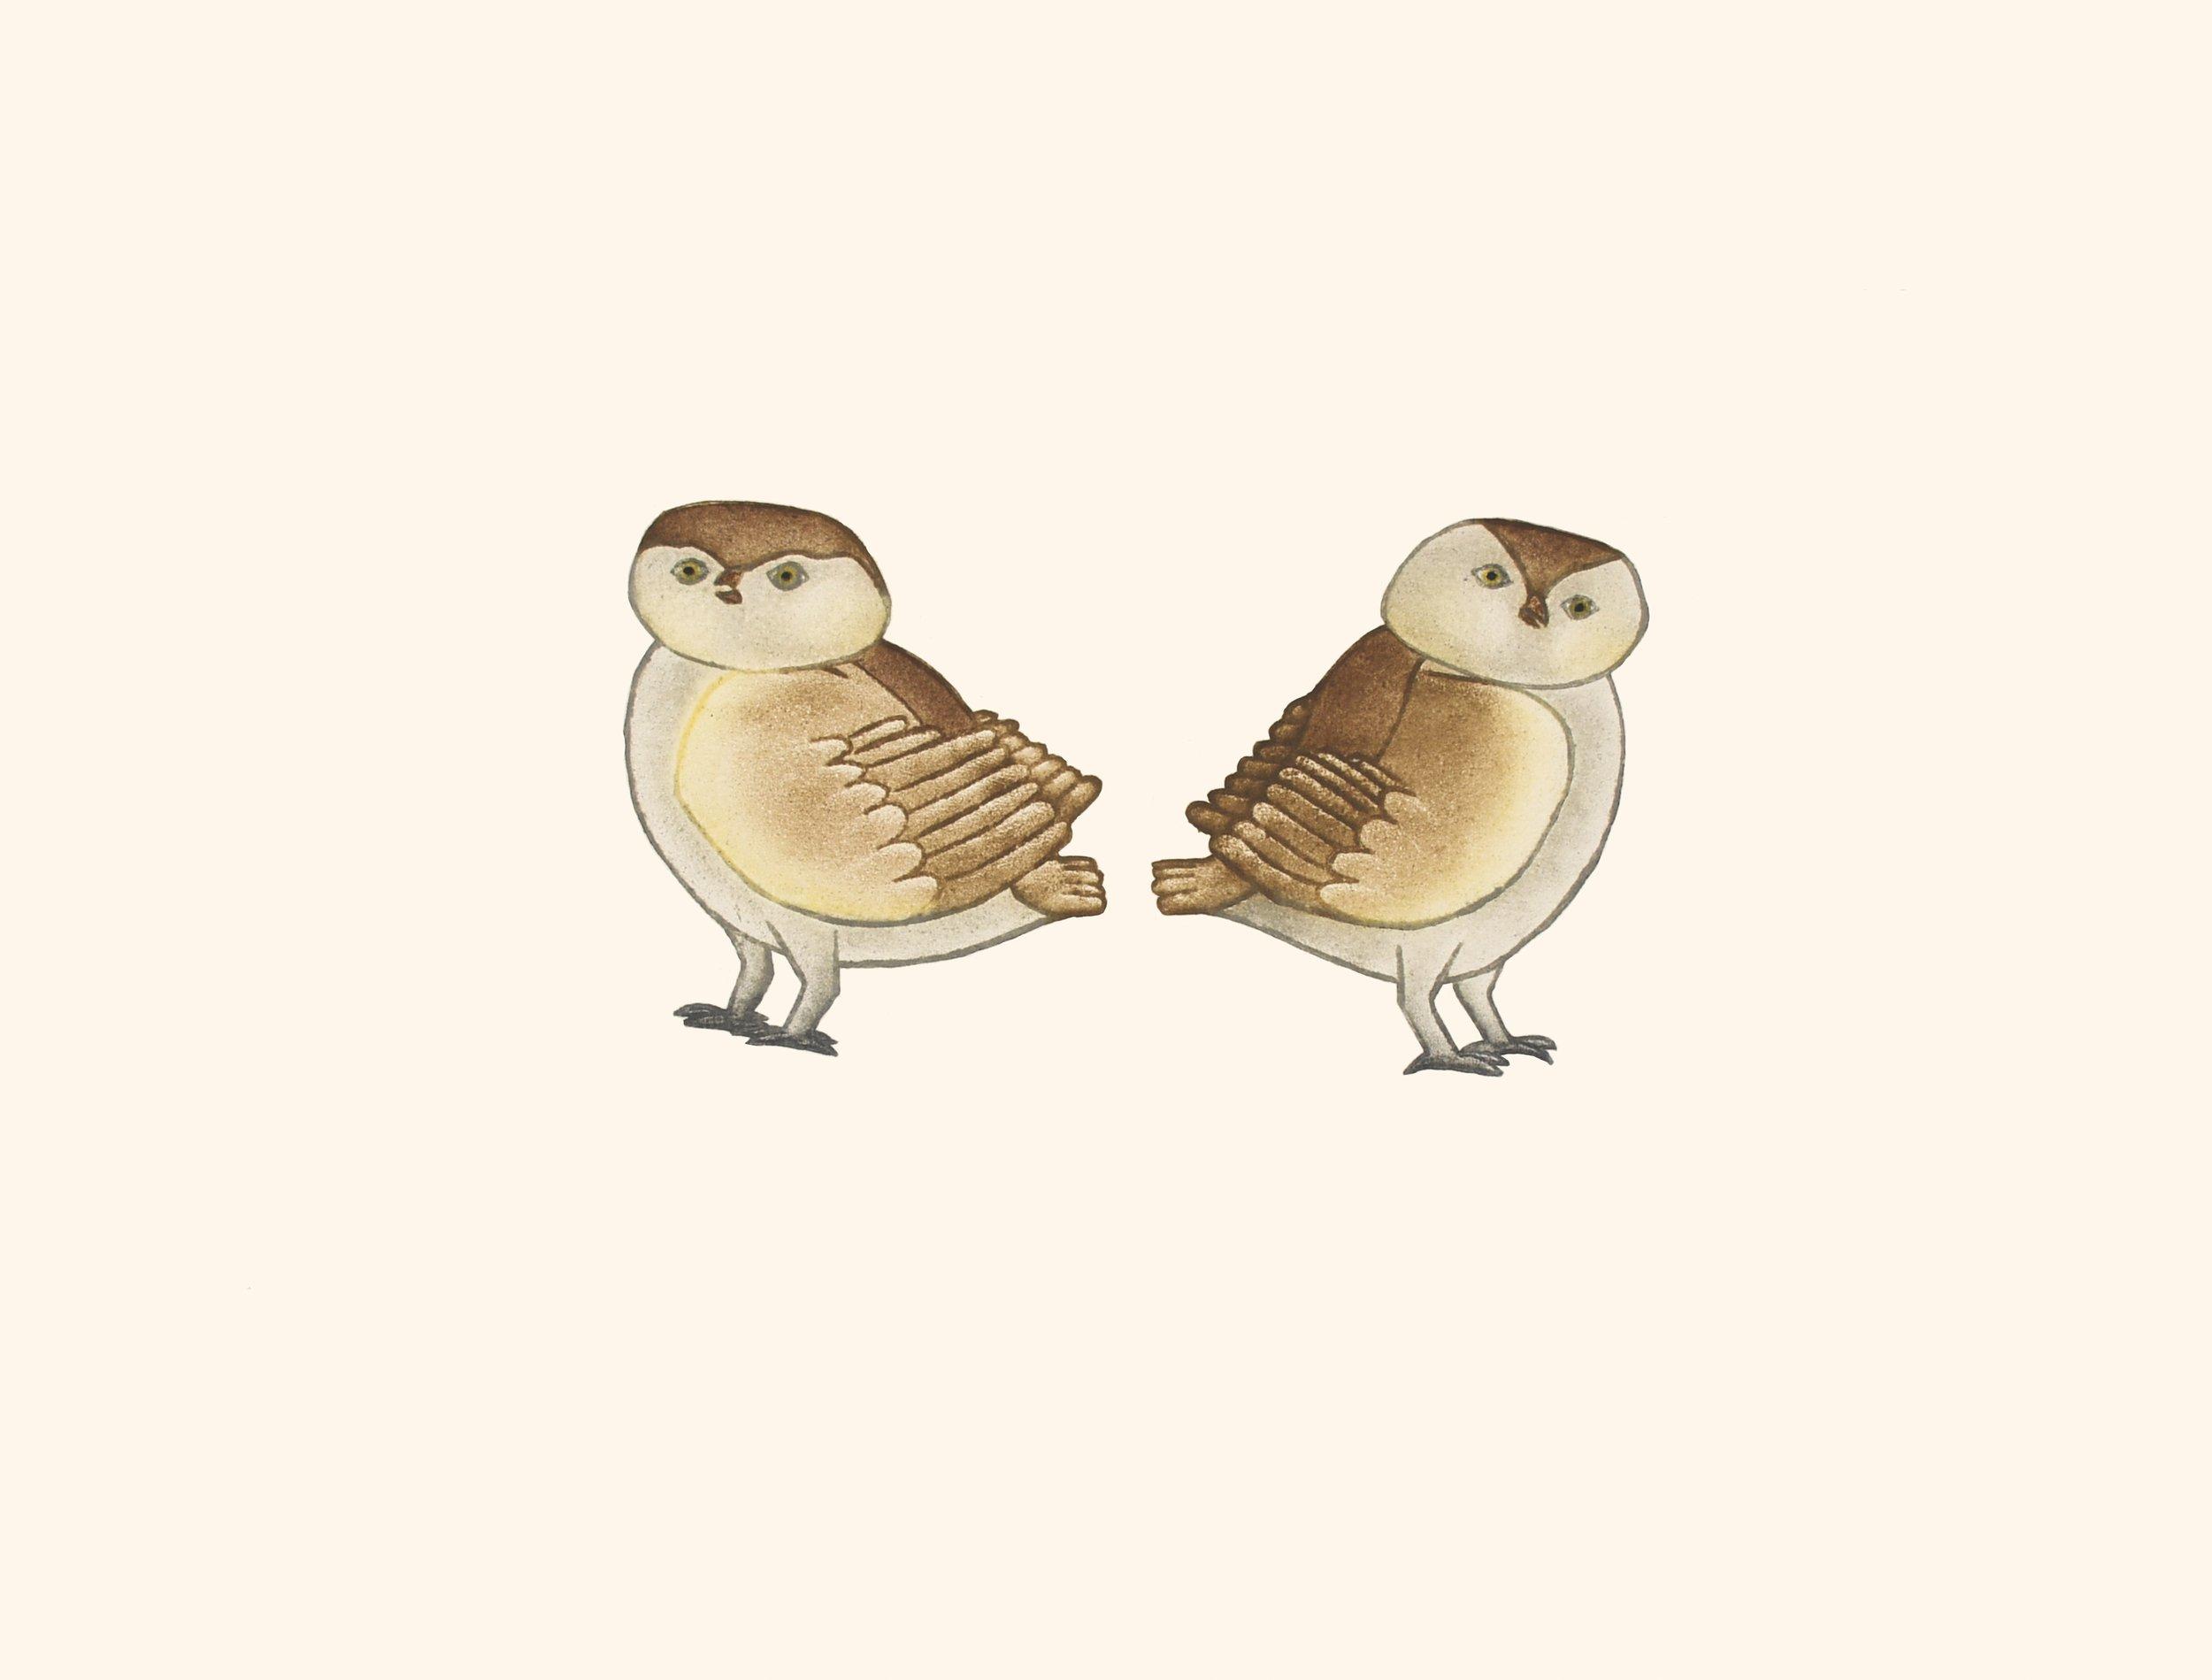 KILLIKTEE KILLIKTEE  24. Owlettes  Etching & Aquatint  Paper: Arches White  Printer: Studio PM  29.3 x 38.3 cm  $ 500